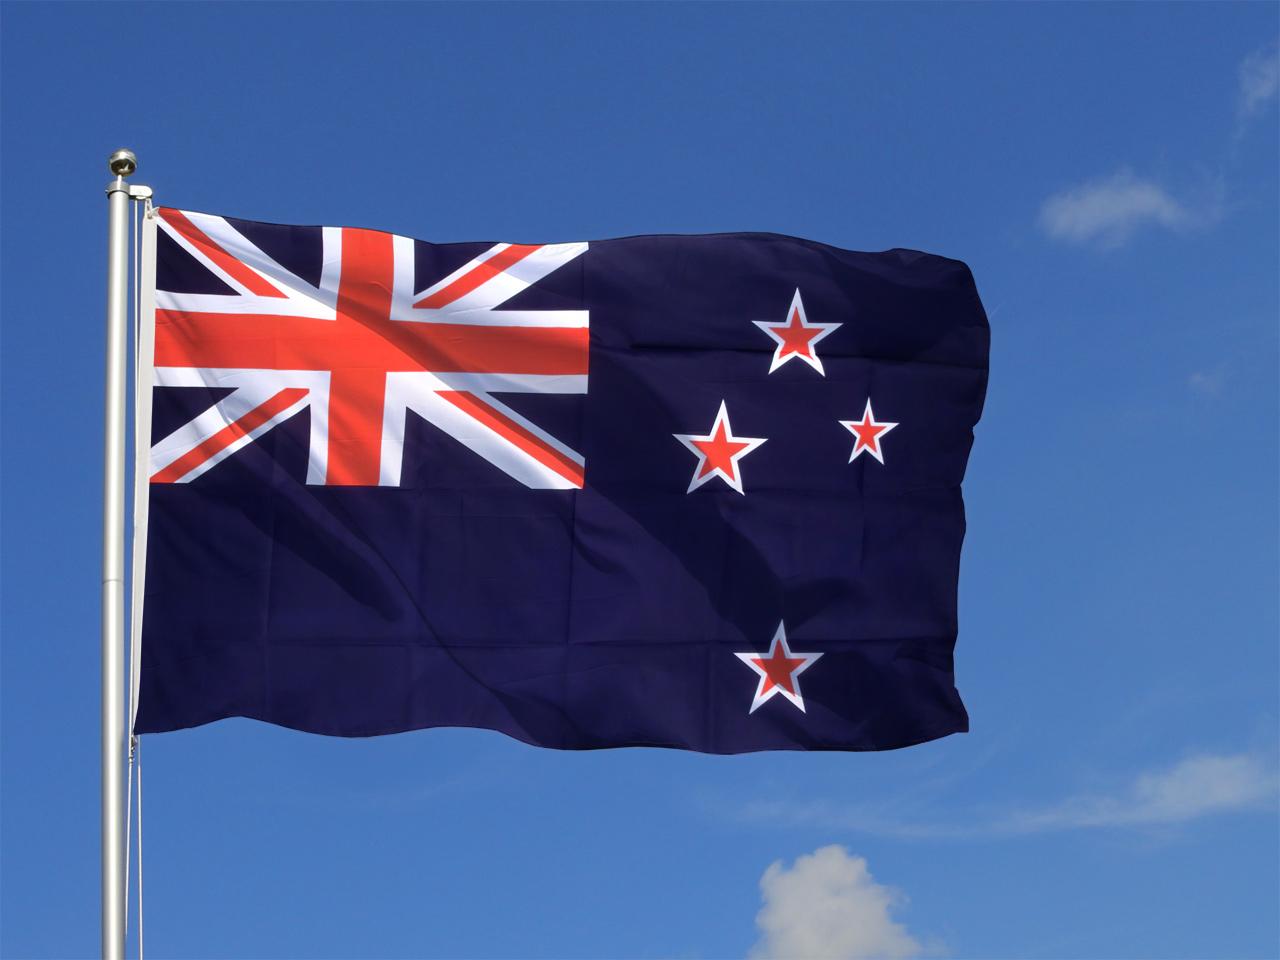 Large New Zealand (NZ) Flag - 5x8 ft - Royal-Flags.co.uk